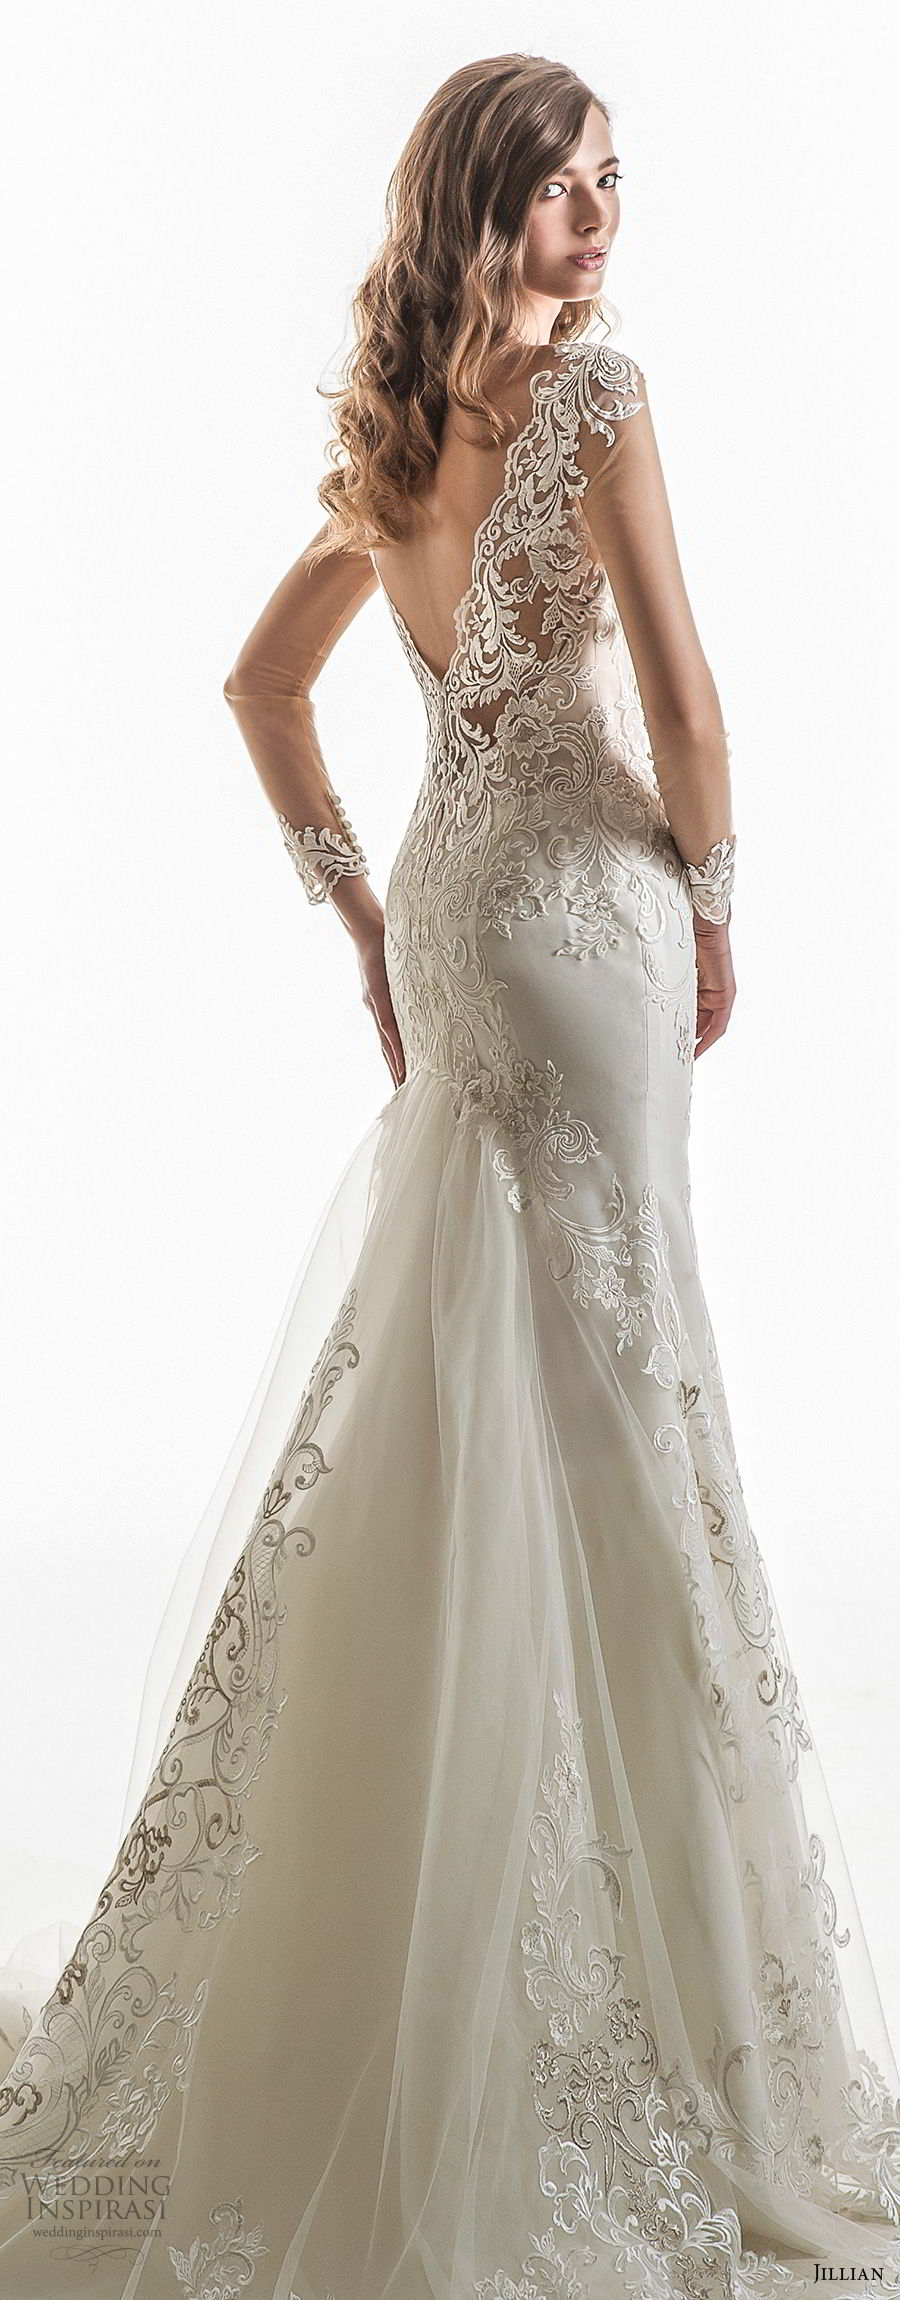 jillian 2018 bridal cap sleeves sweetheart neckline heavily embellished bodice elegant sheath wedding dress open v back chapel train (03) zbv